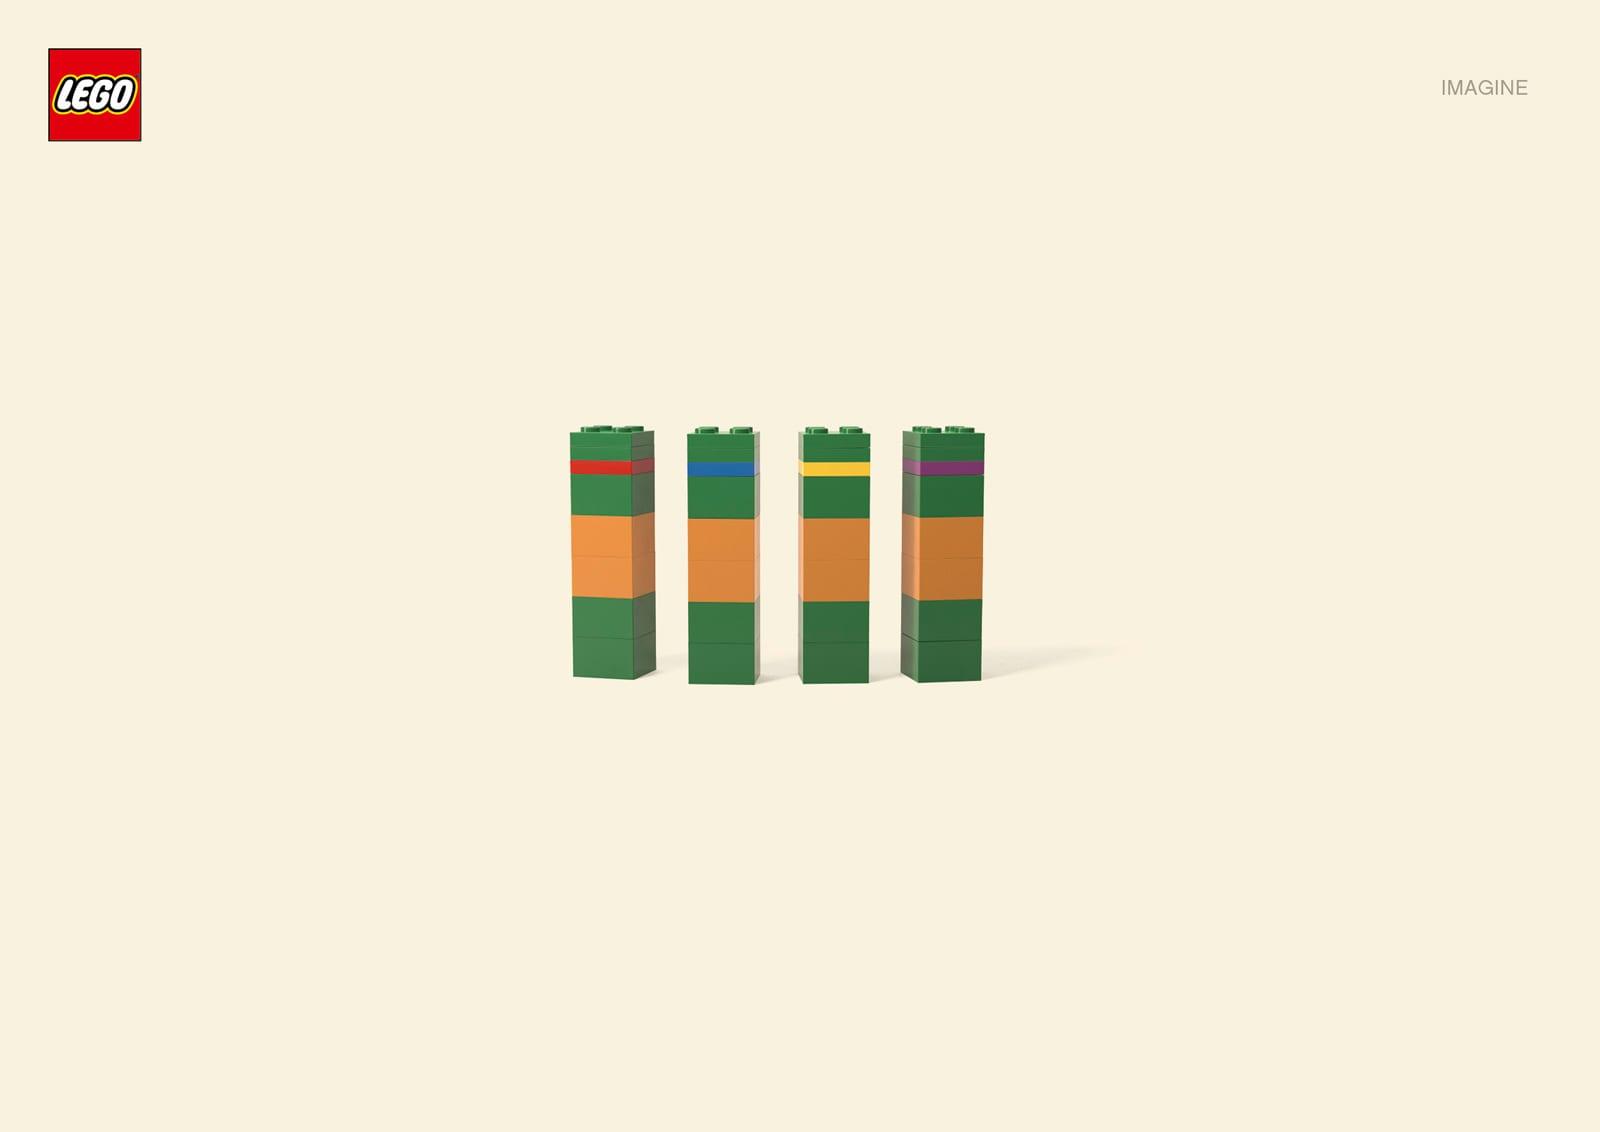 lego minimalista (6)